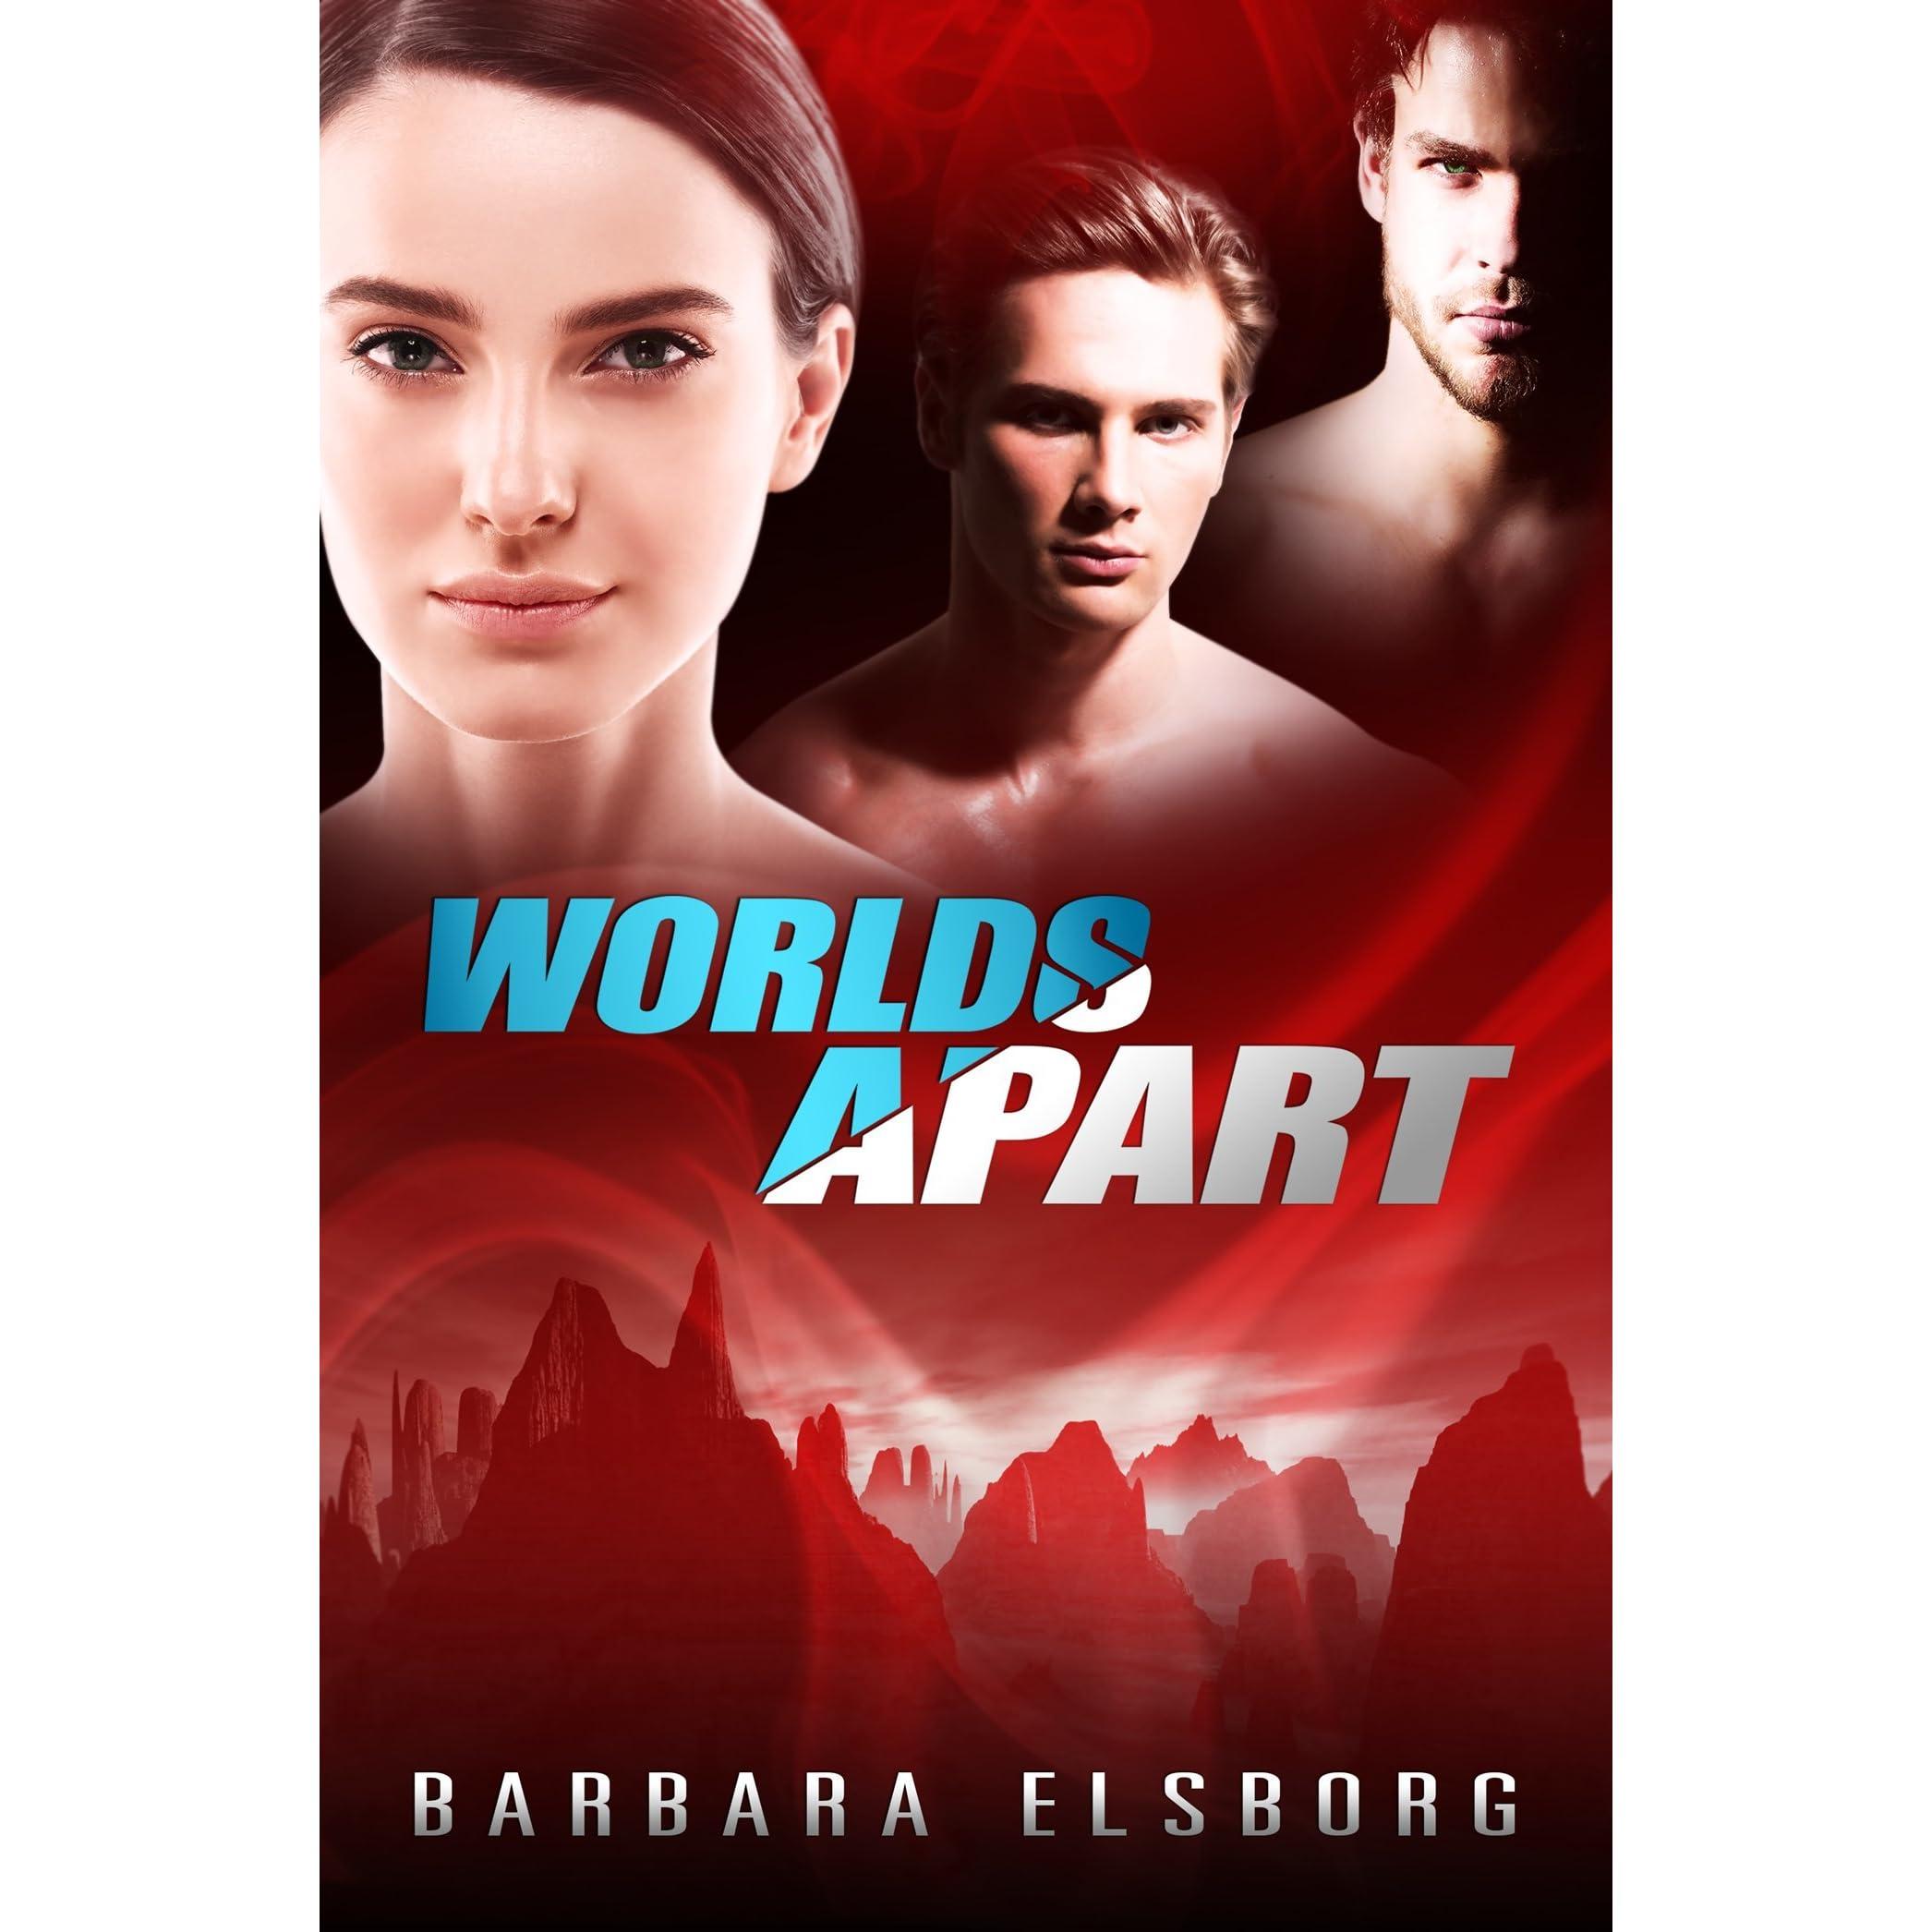 Barbara elsborg goodreads giveaways